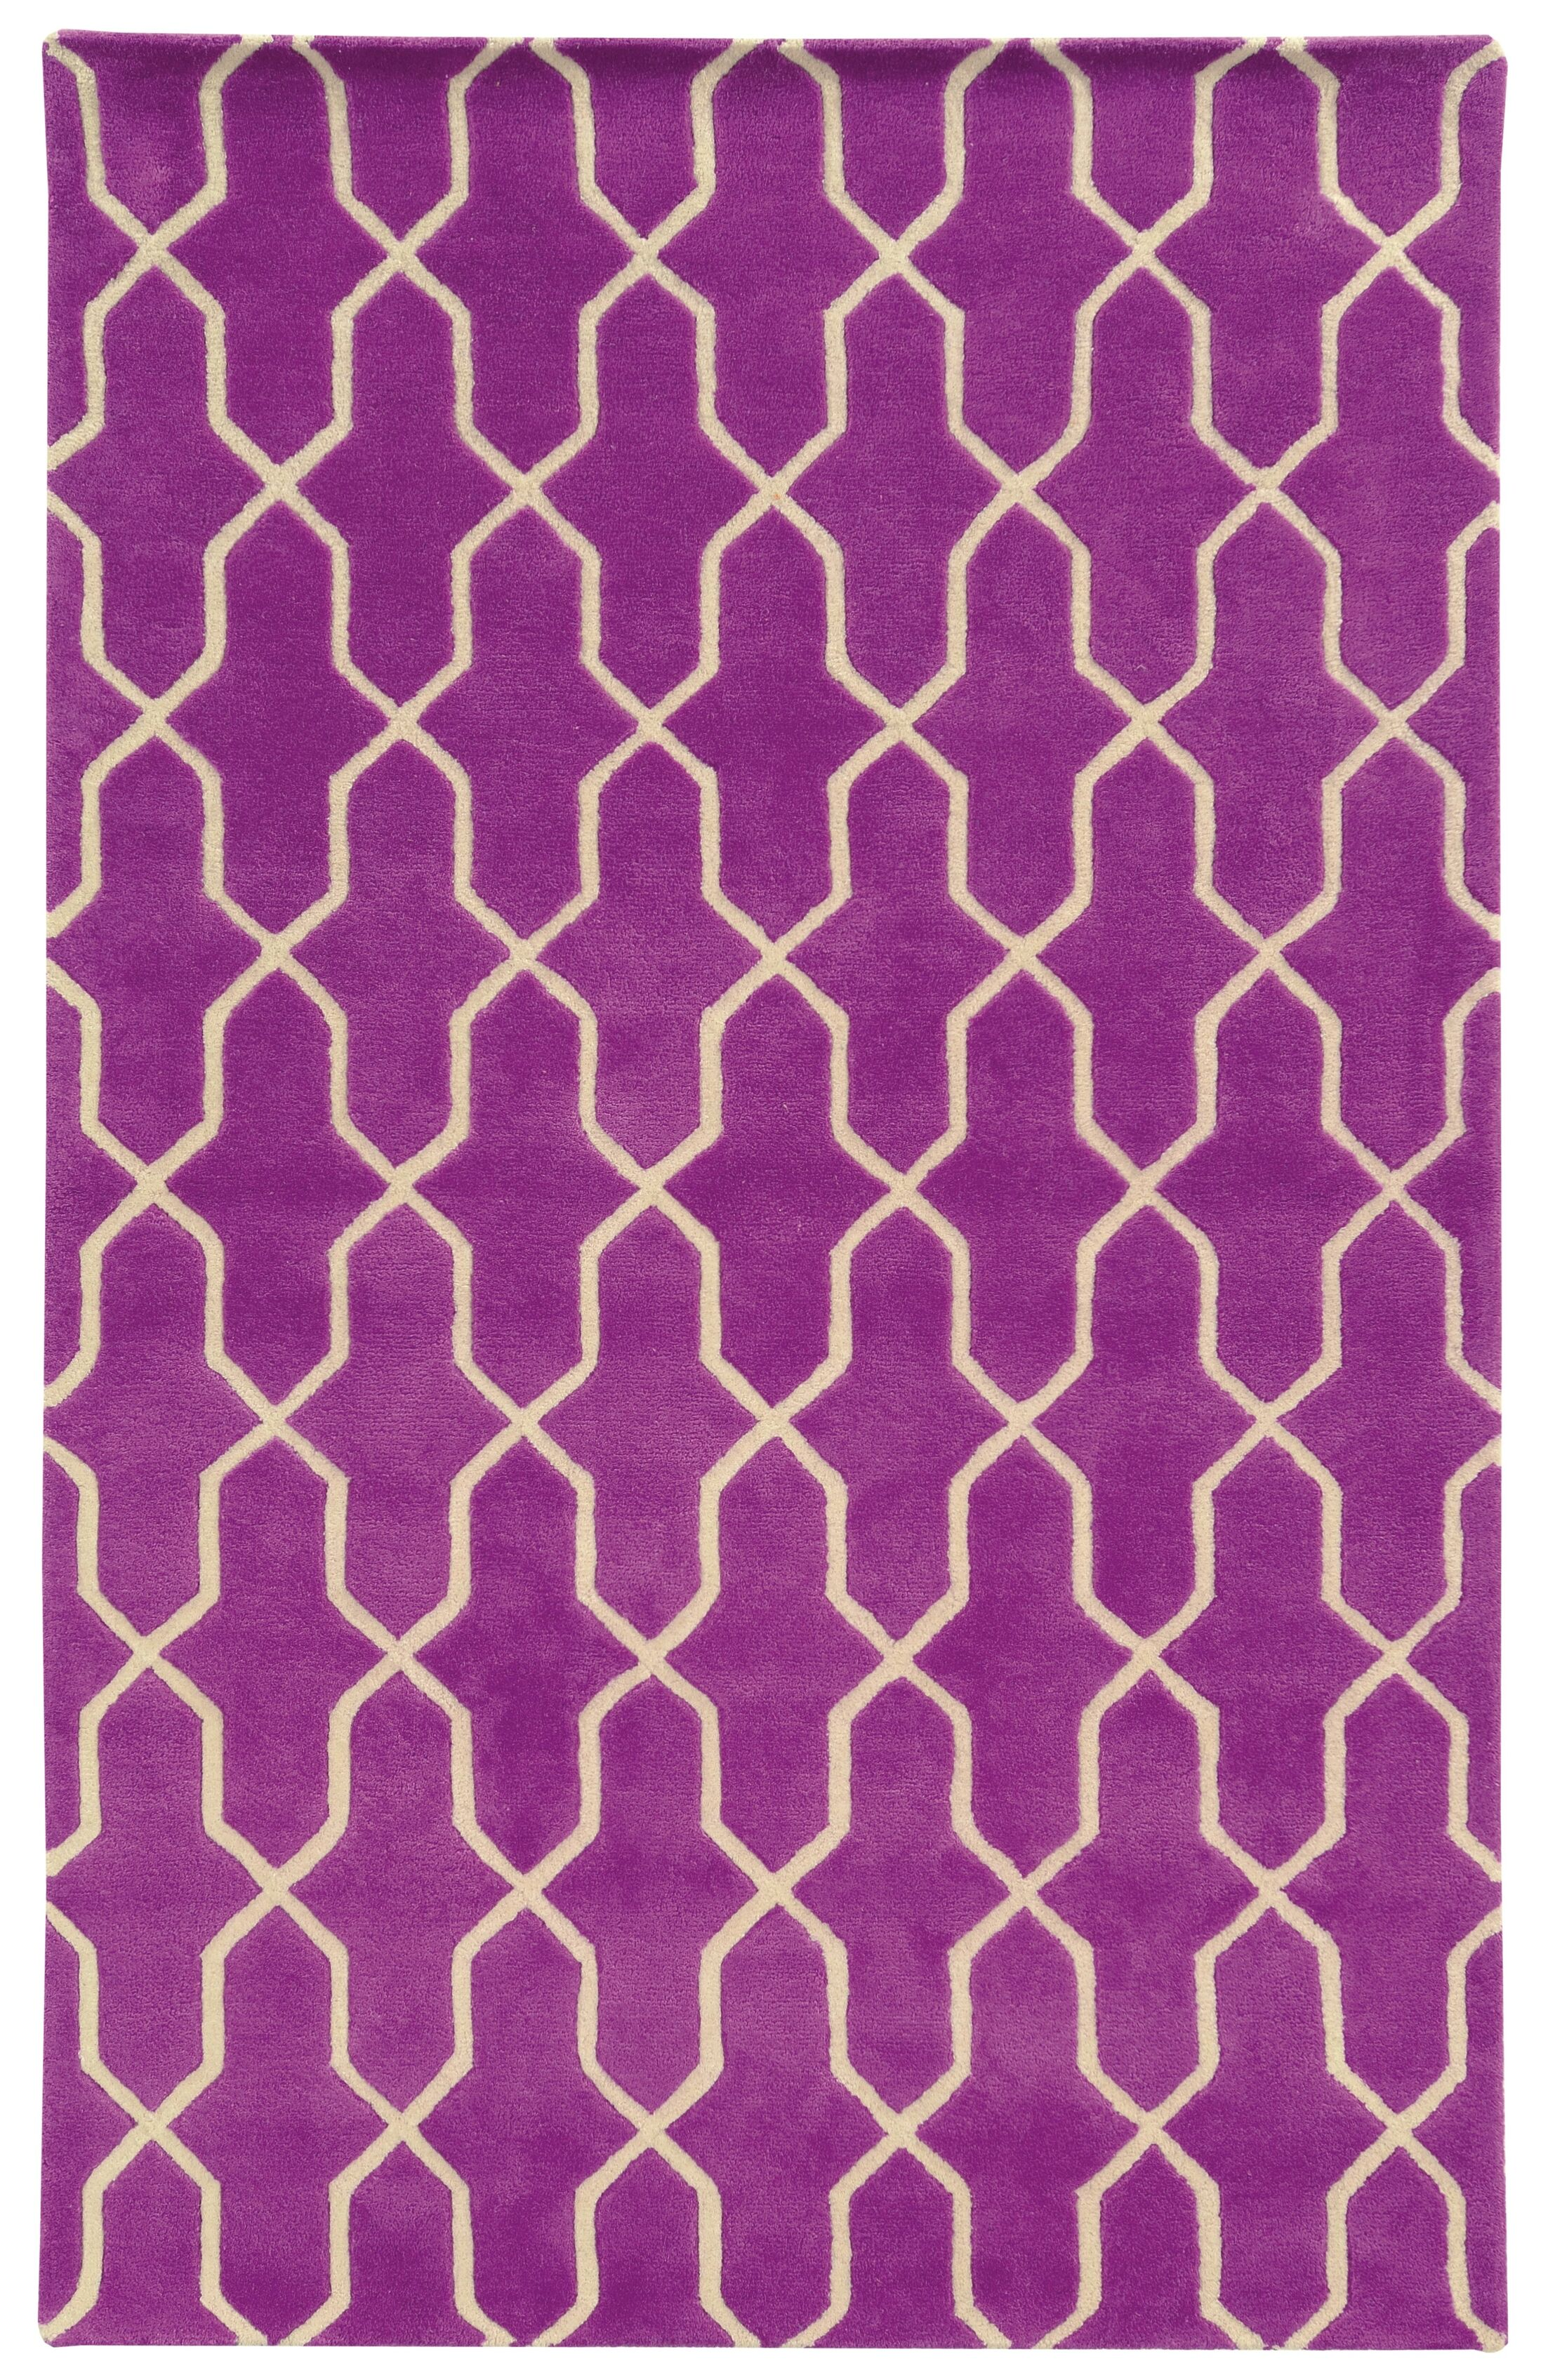 Optic Geometric Purple & Ivory Area Rug Rug Size: Rectangle 3'6